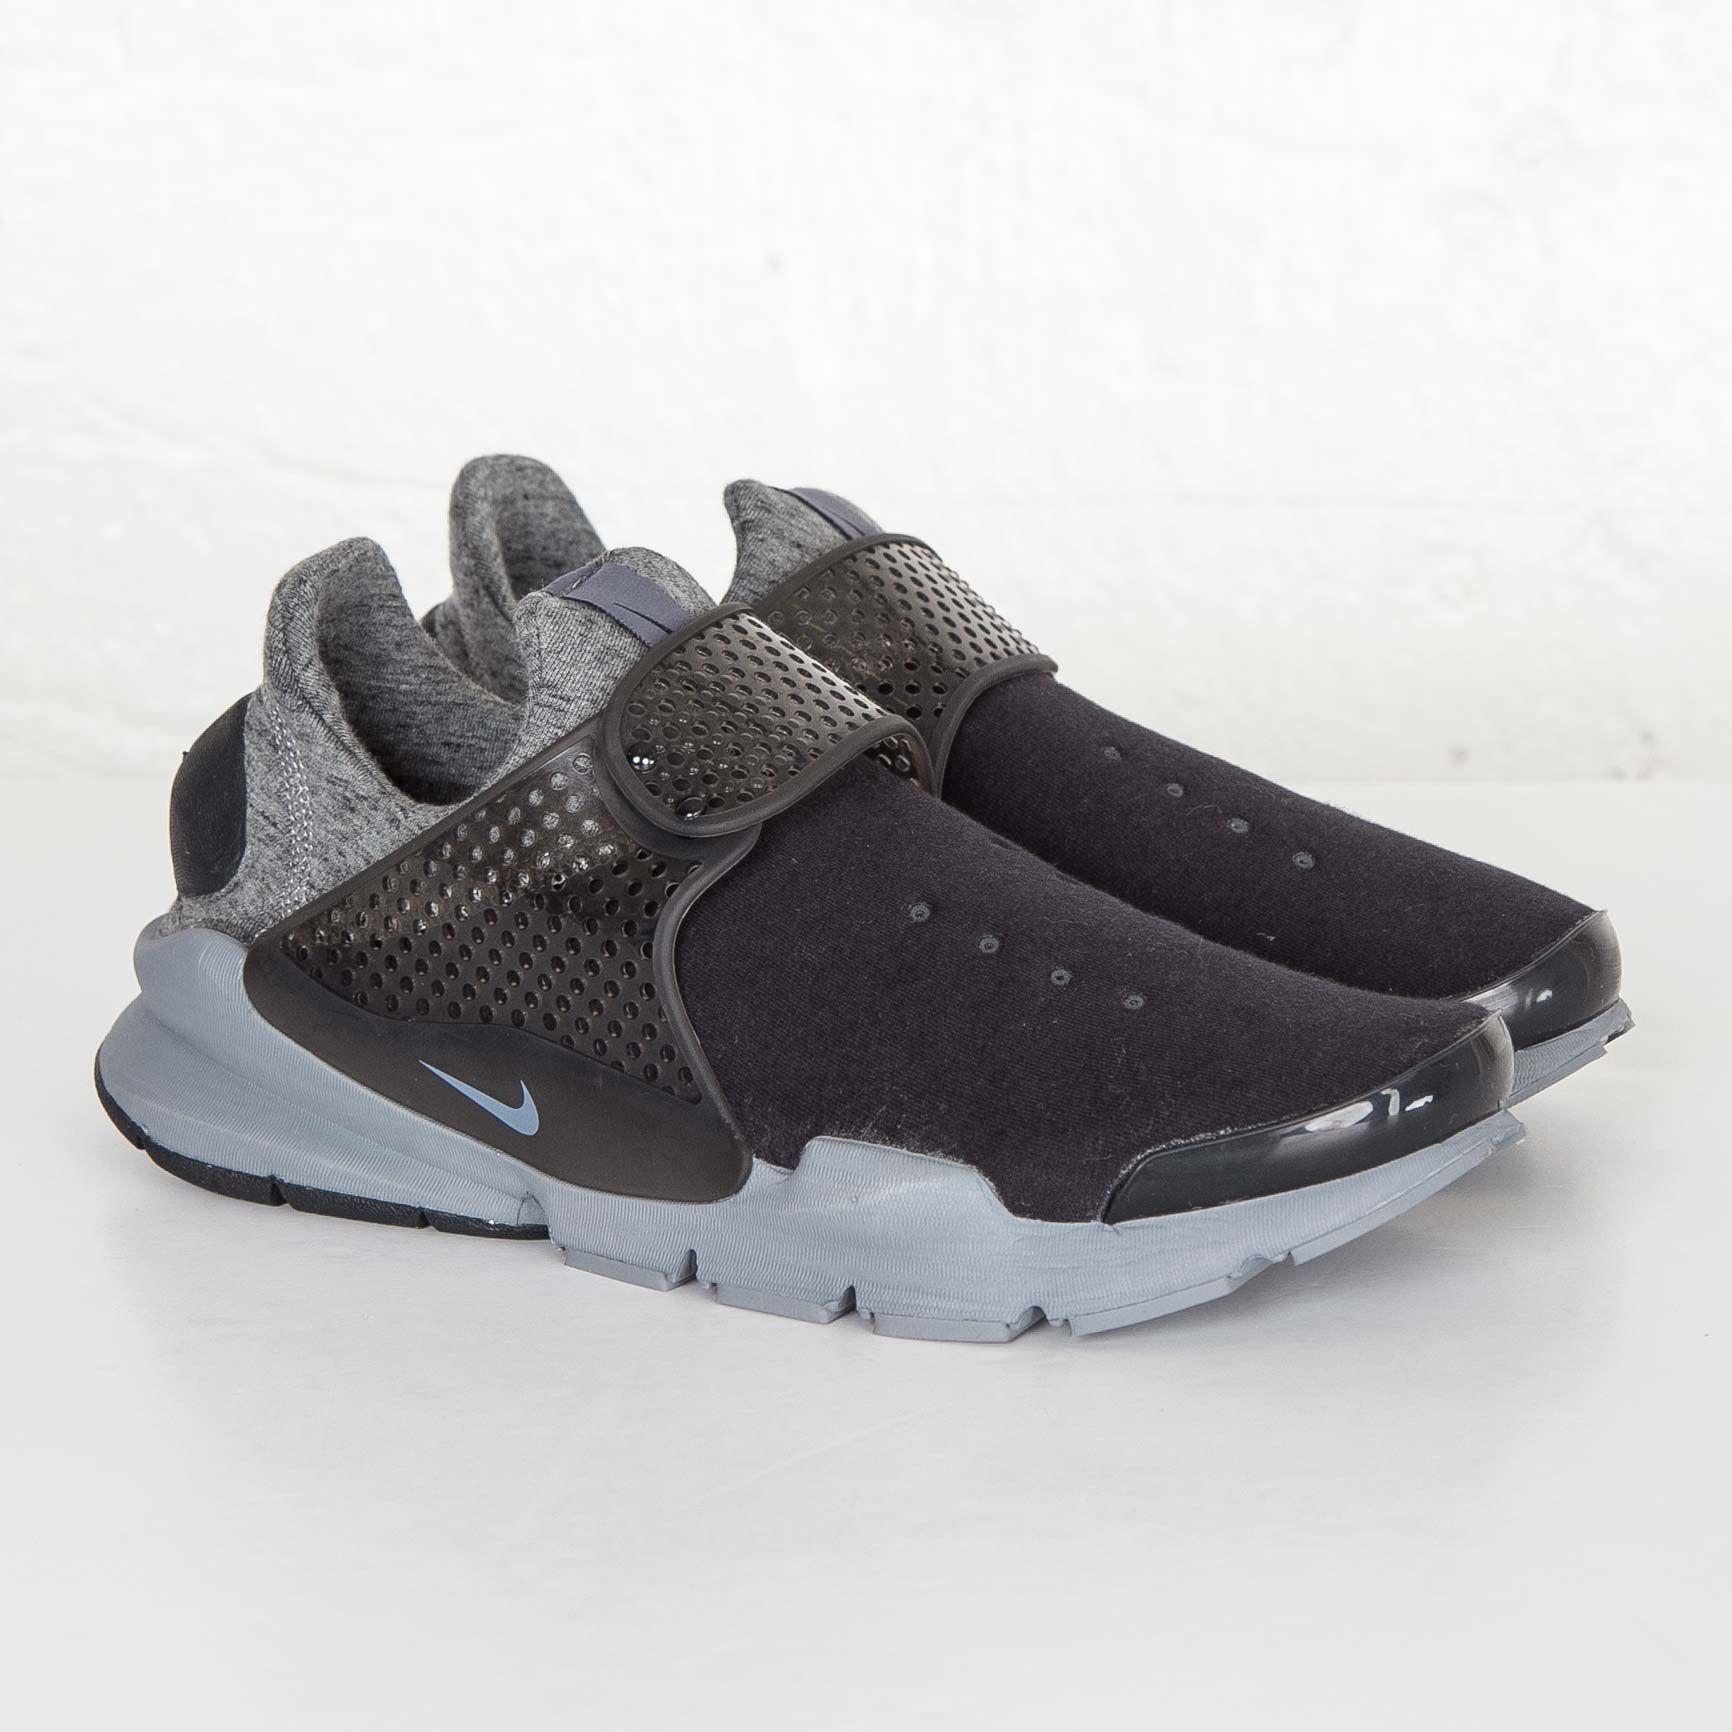 best sneakers dc8b0 343d8 Nike Sock Dart Tech Fleece | clothes | Pinterest | Nike ...